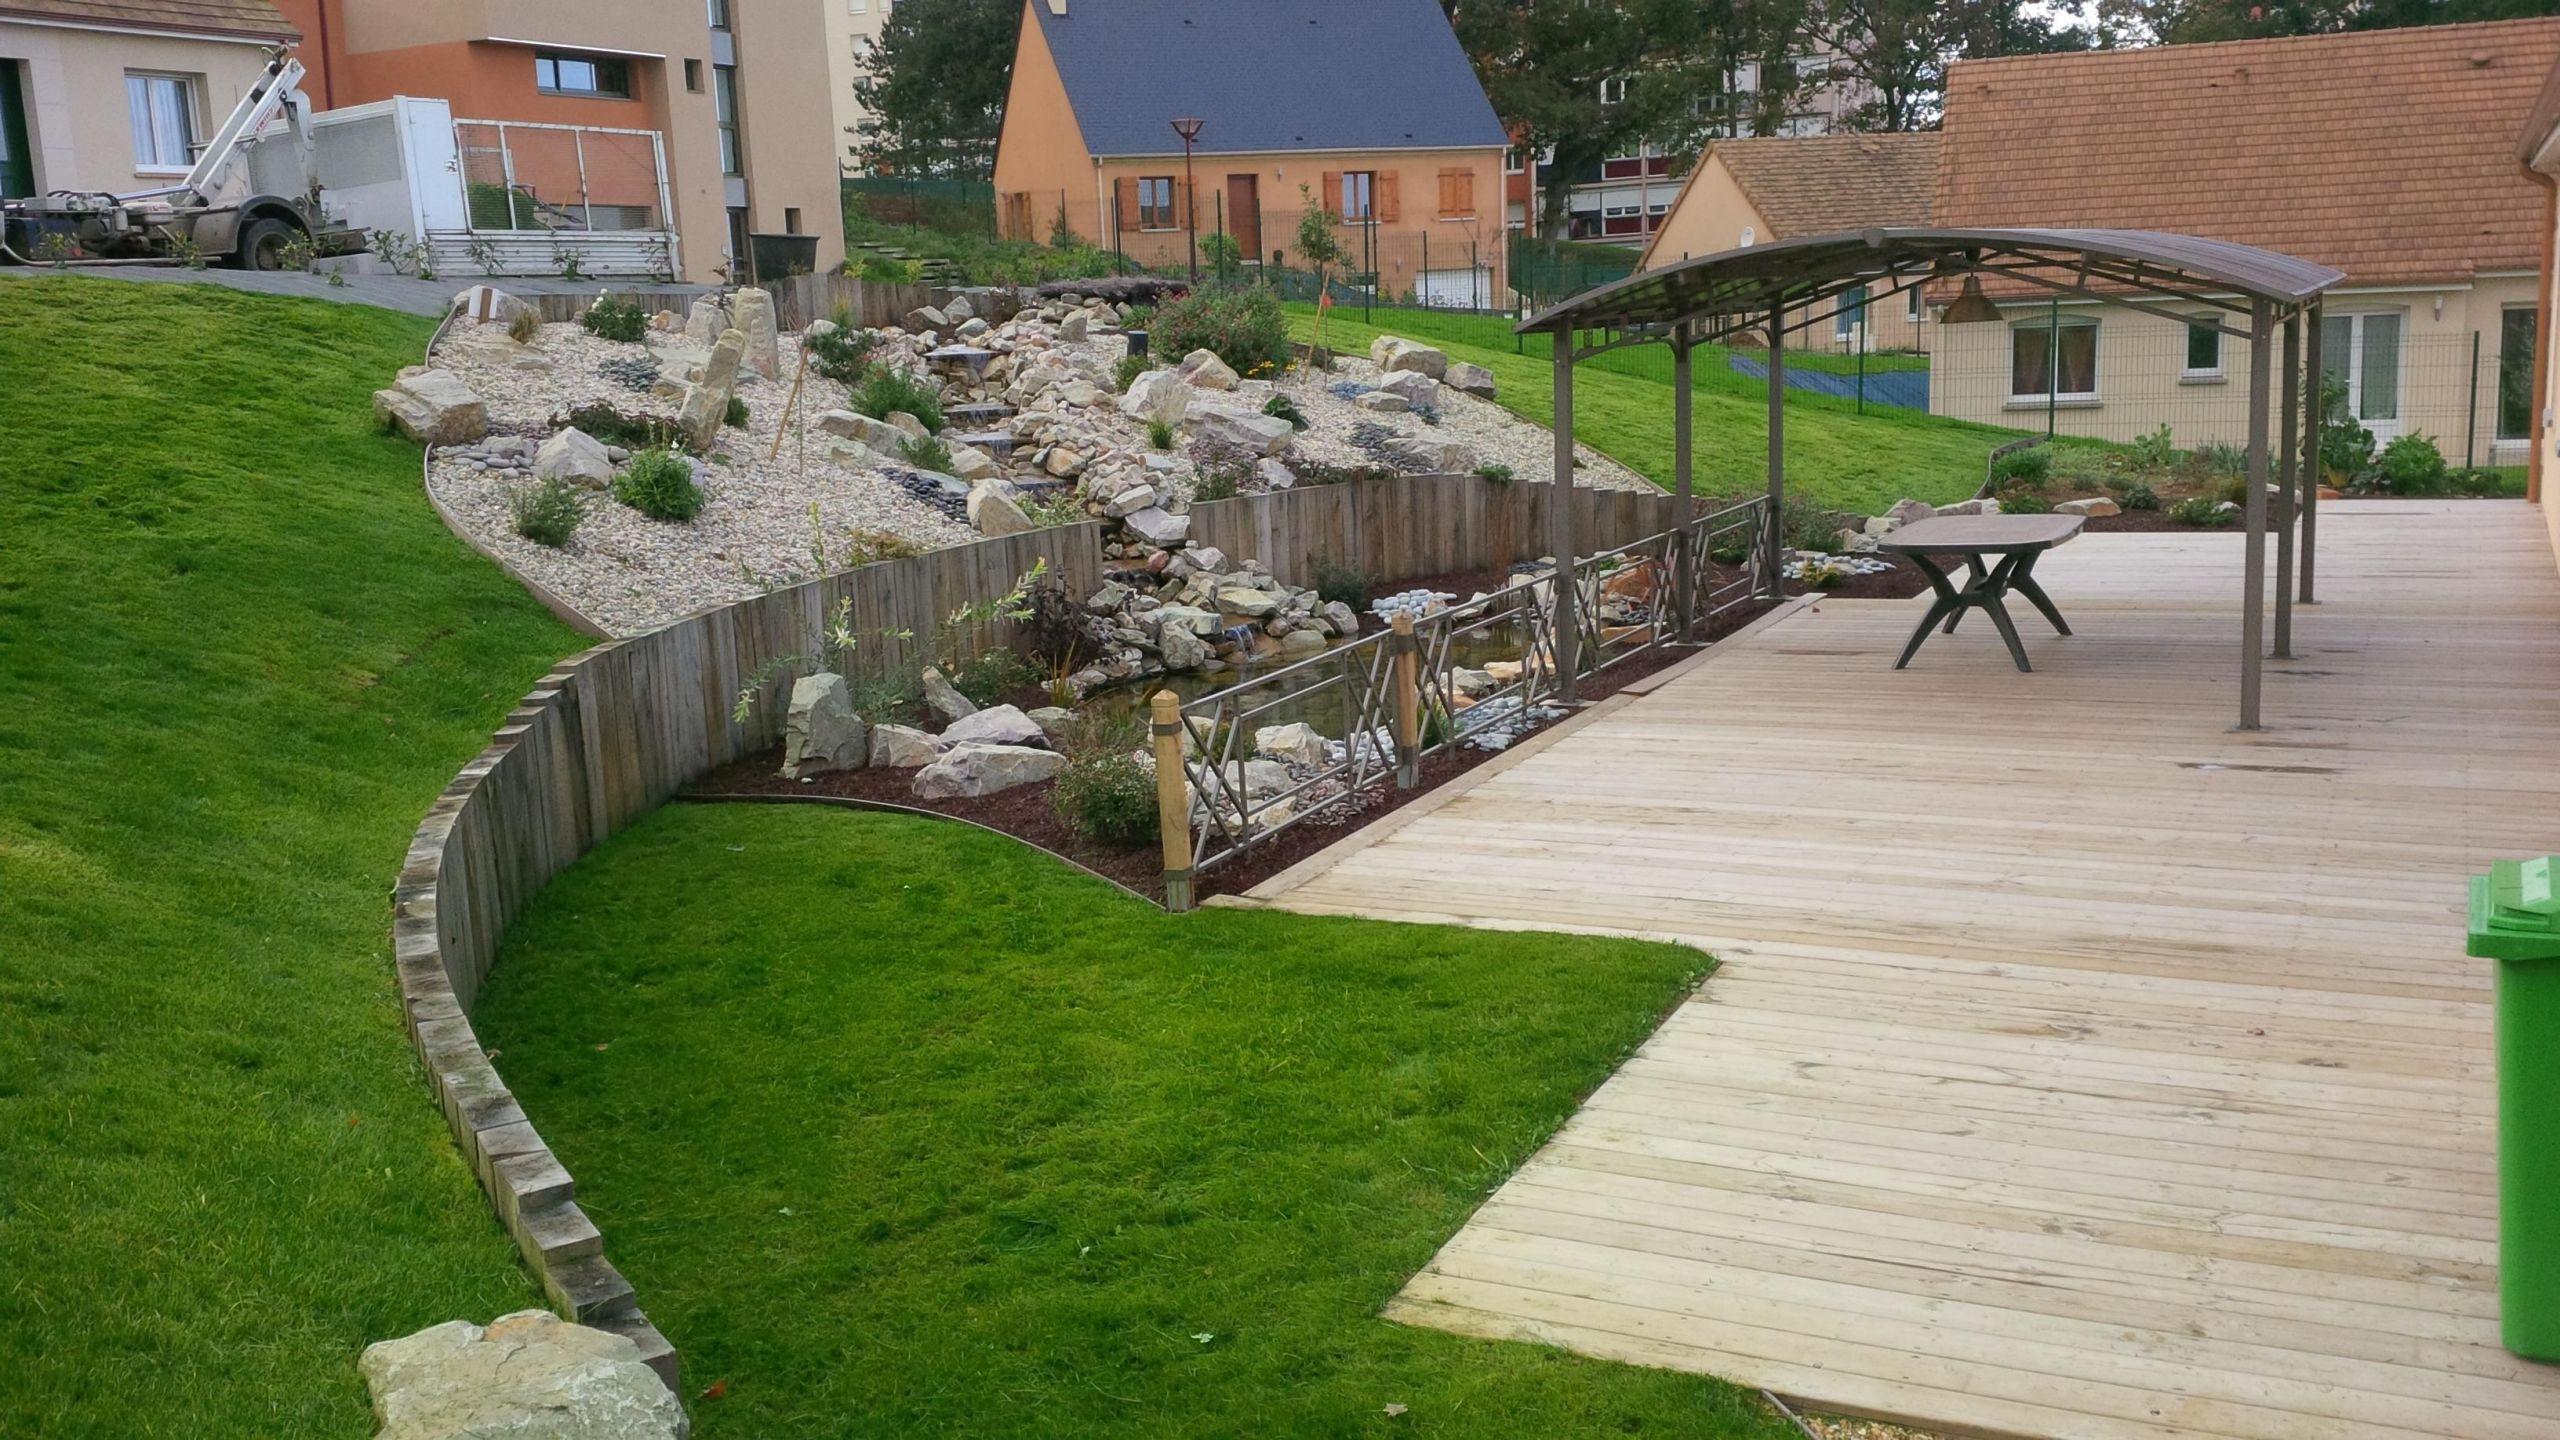 Jardin en pente Aménagement paysager butte